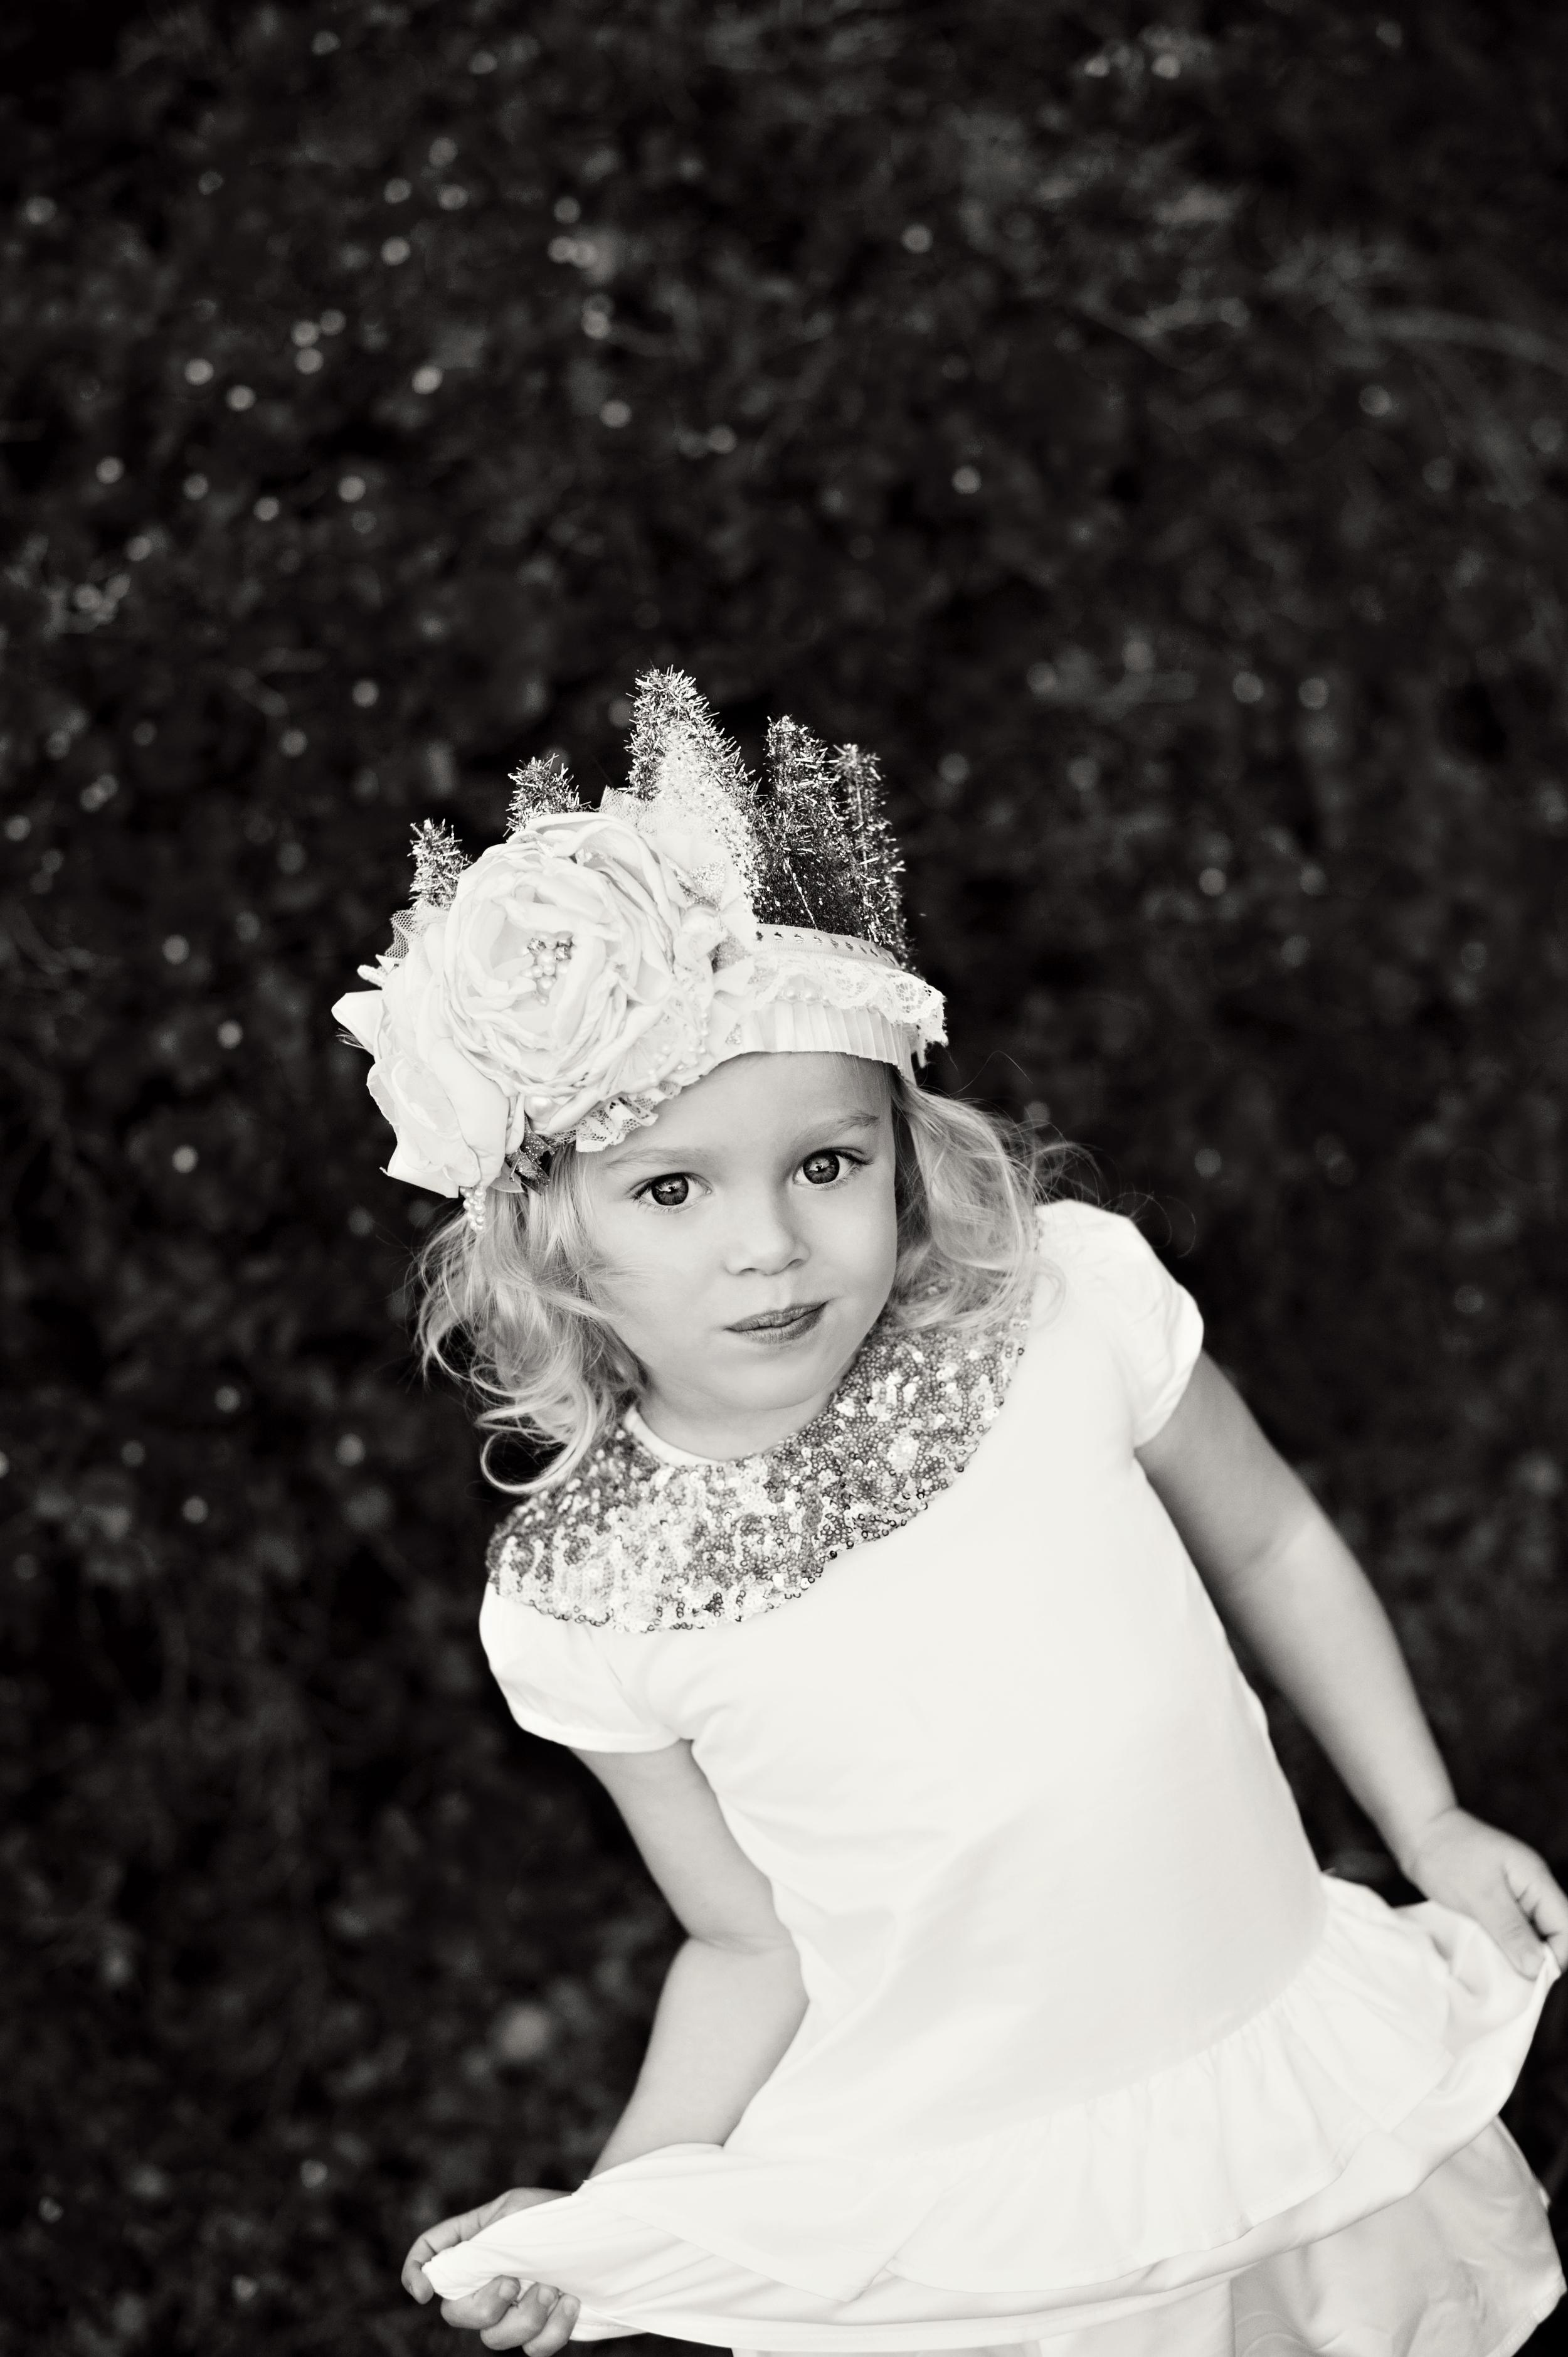 SanDiego-Kids-Portraits-Birthday-Photography